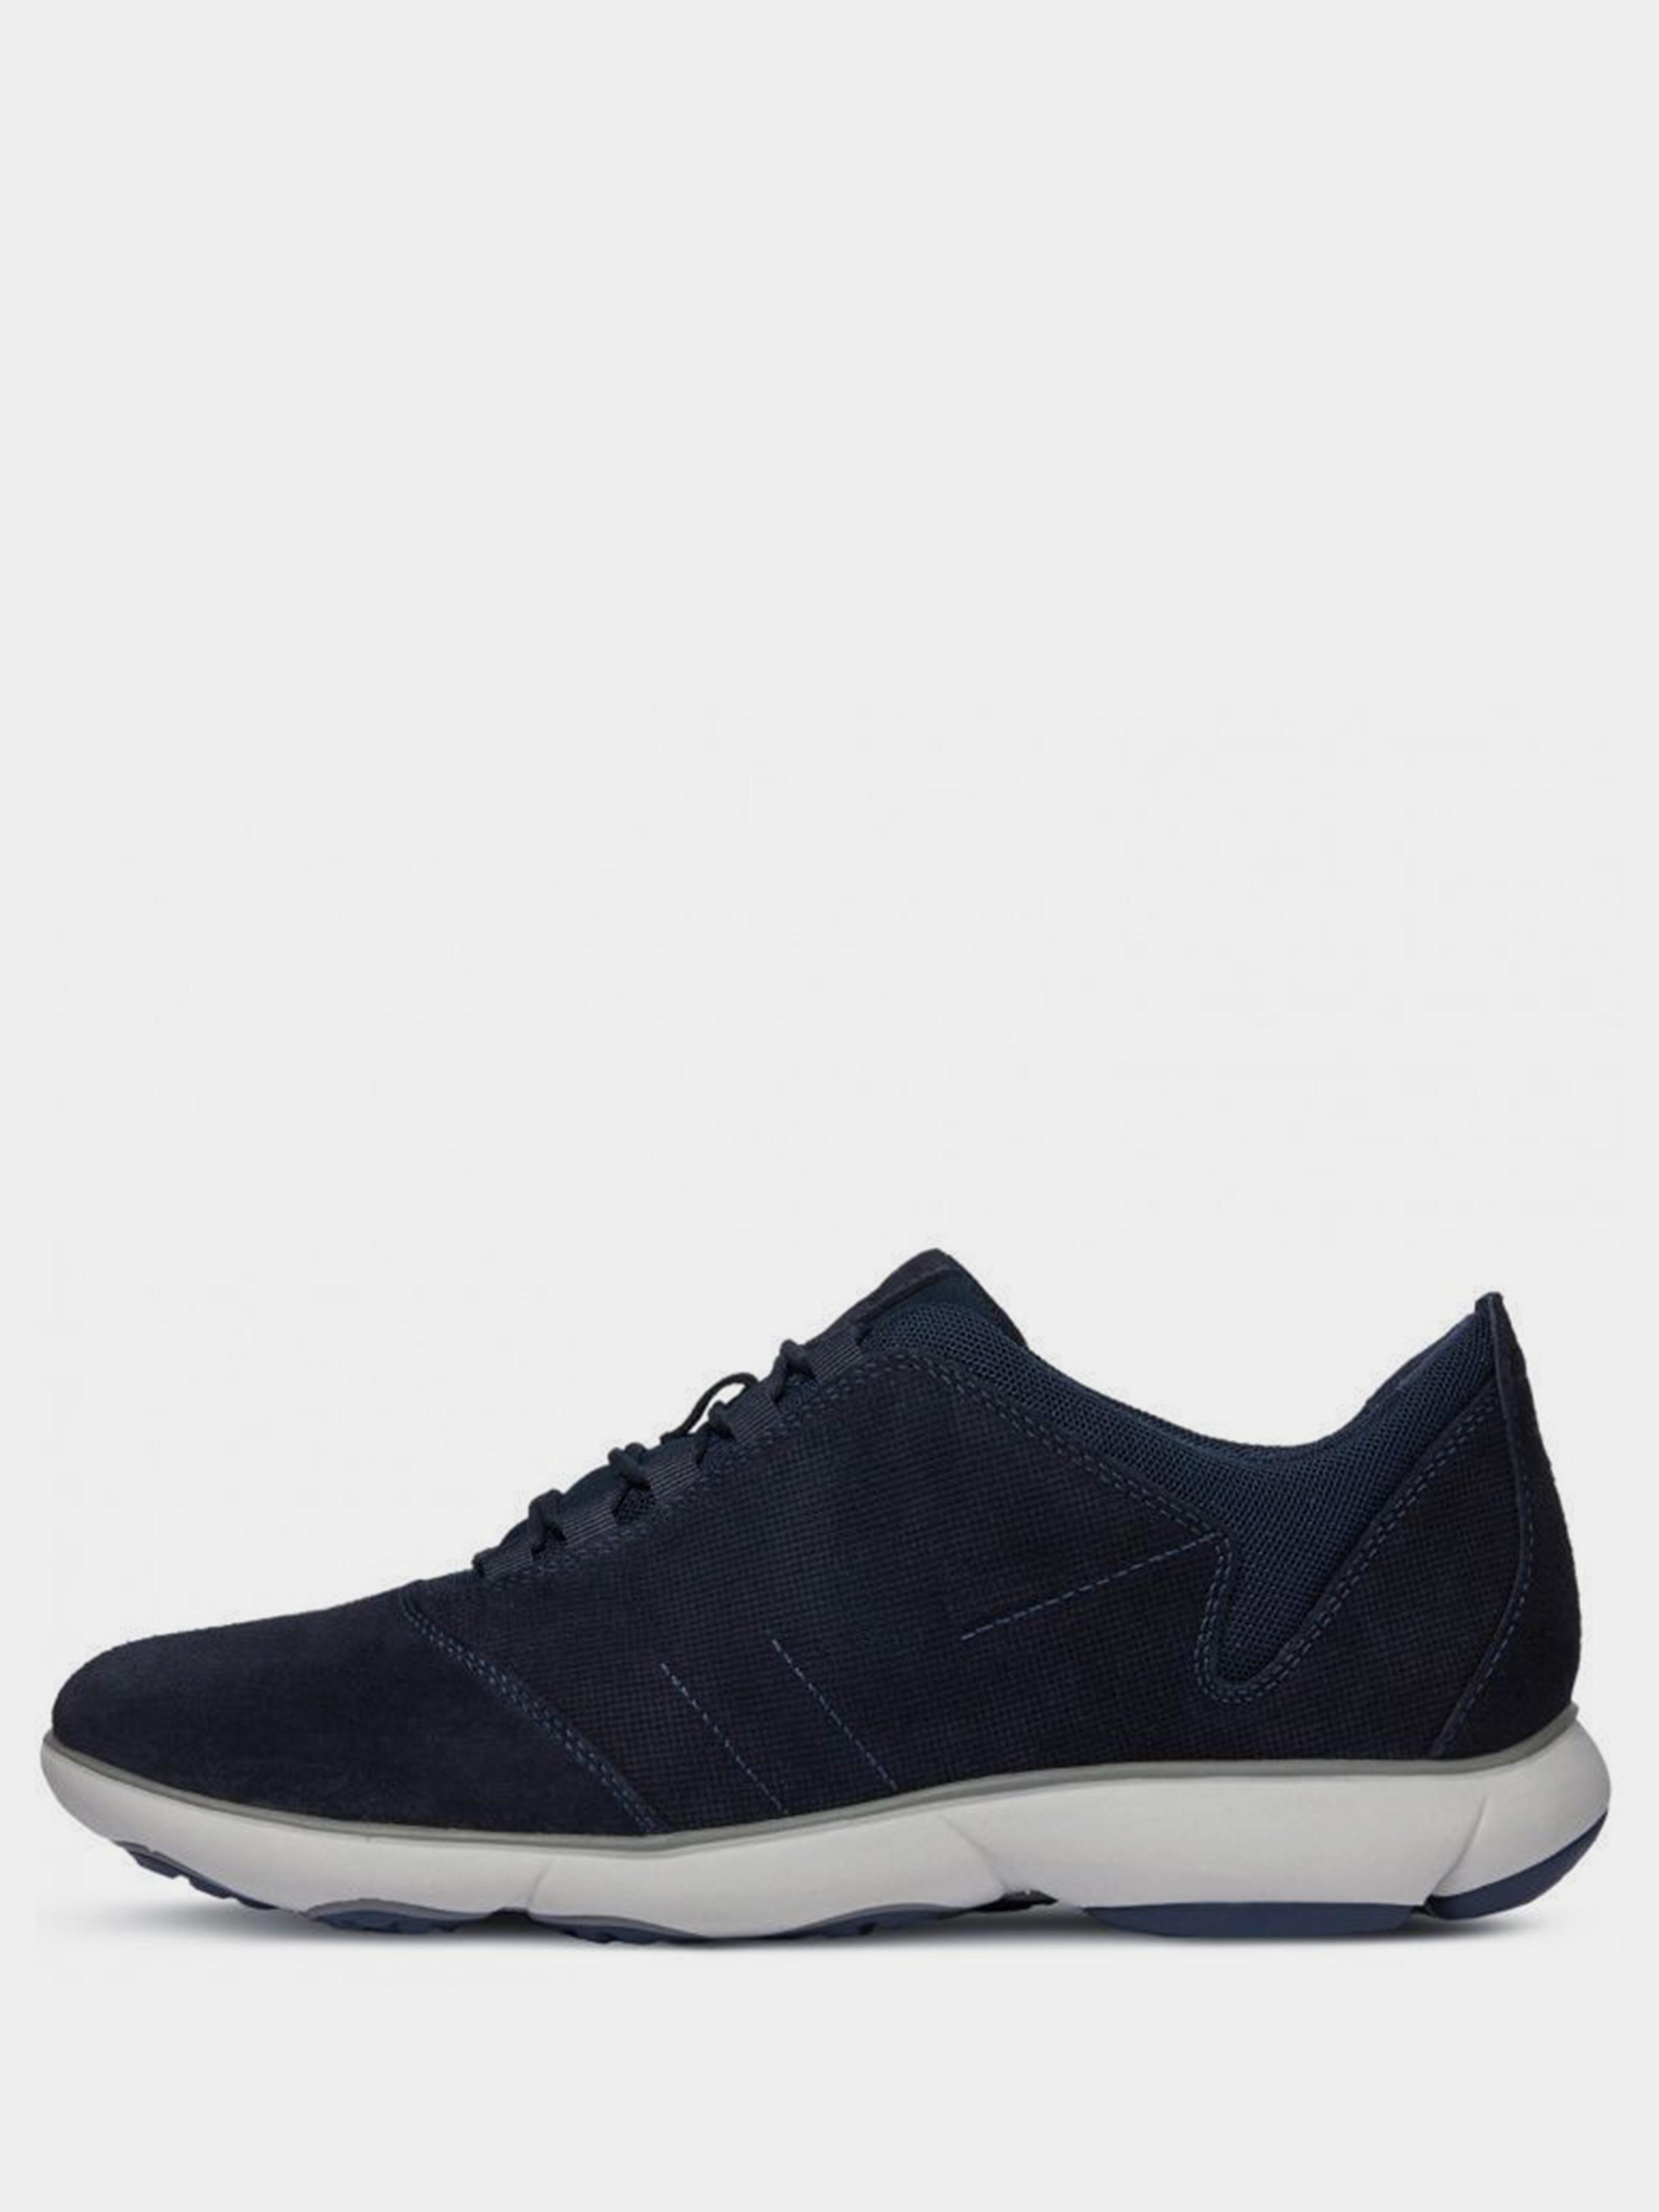 Кроссовки для мужчин Geox NEBULA XM1871 купить обувь, 2017